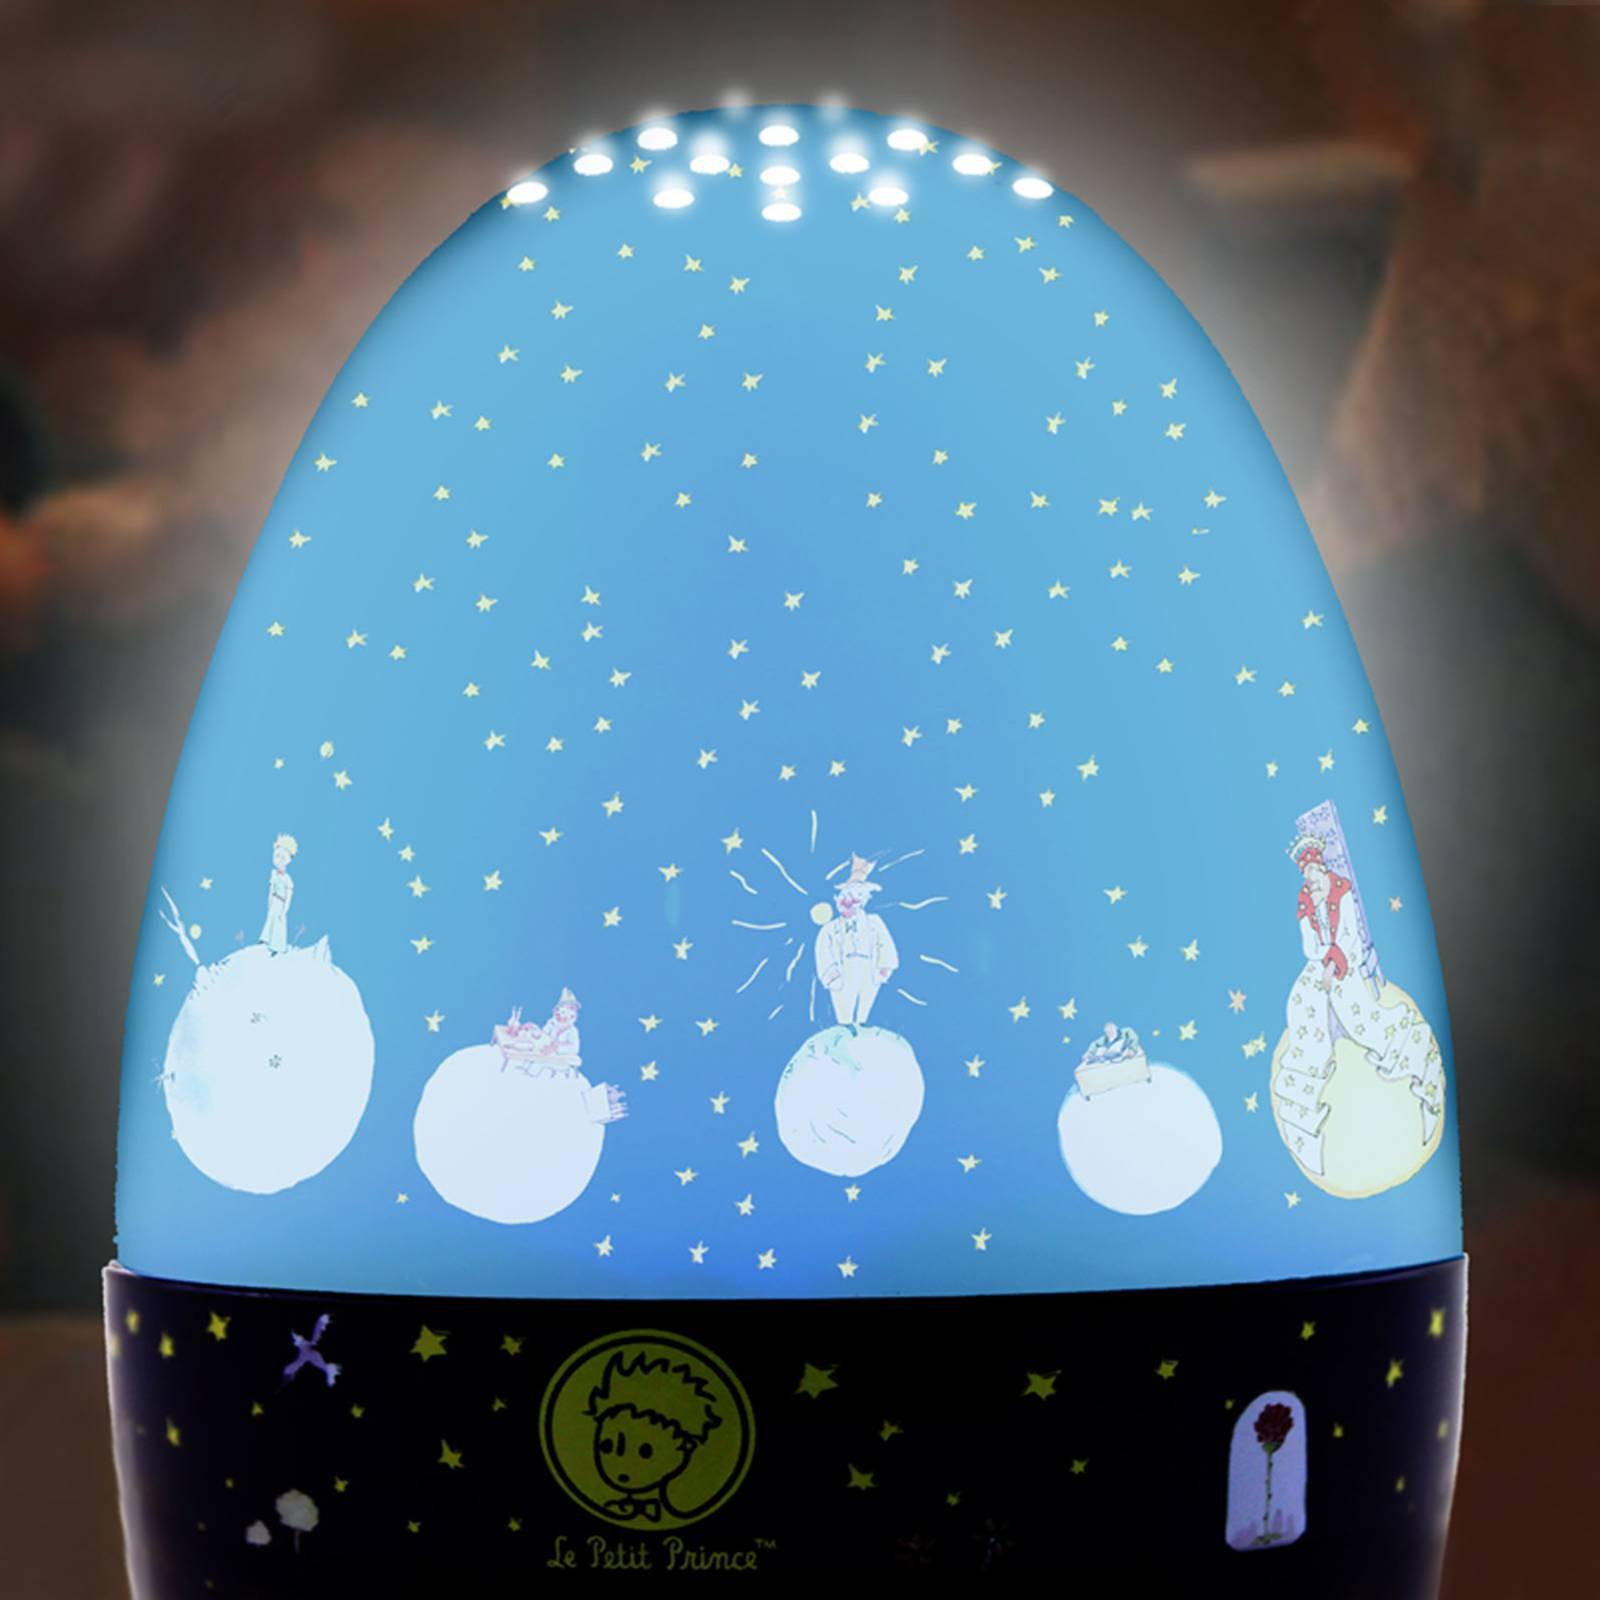 LED-nattlampe Lille Prins, lykt med spilledåse